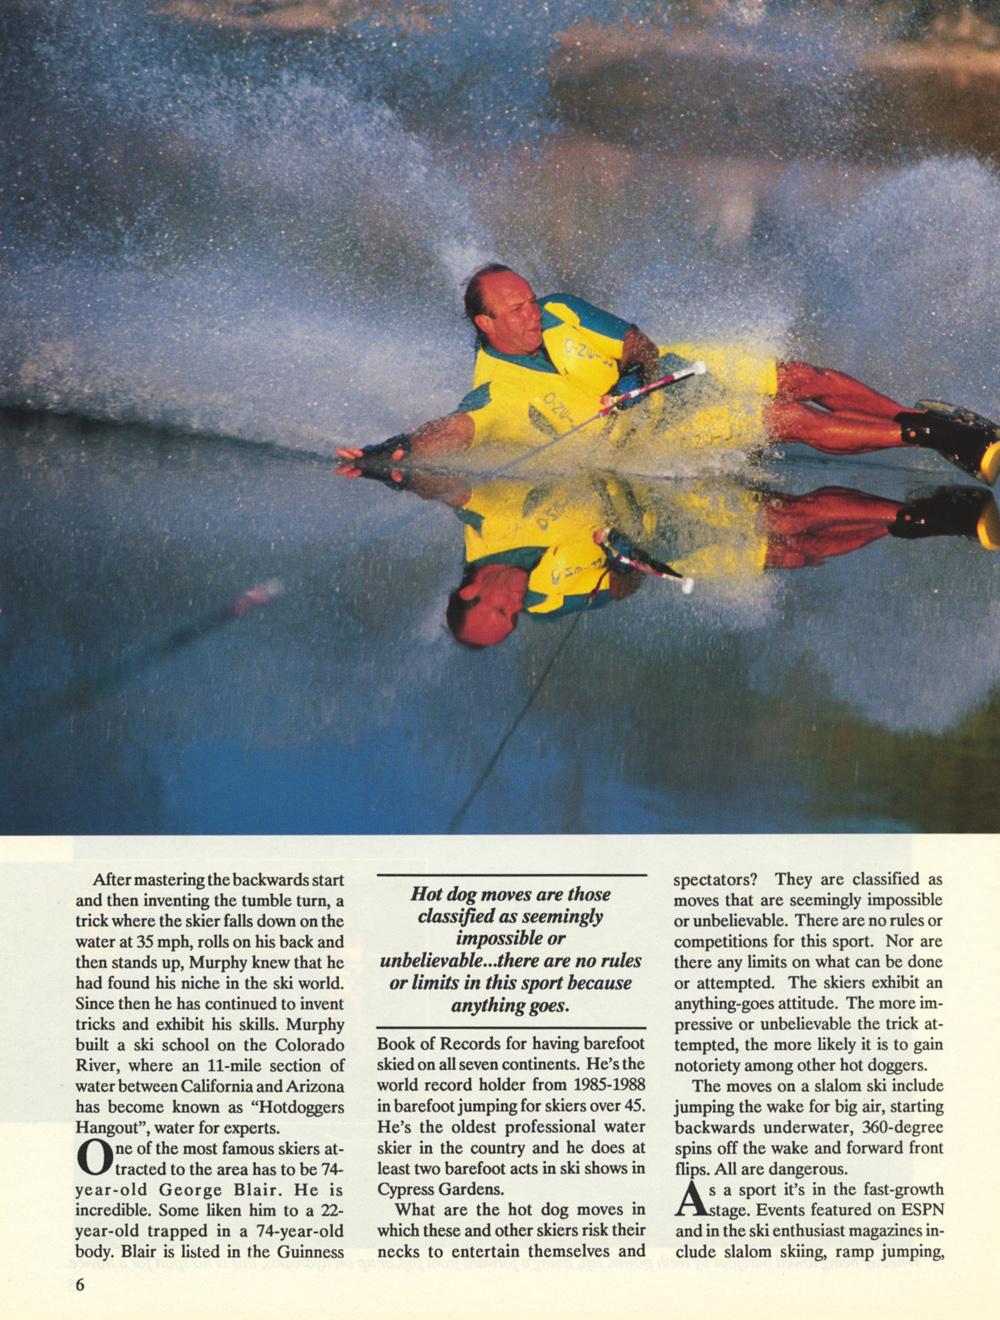 Nissan Hot Dog Water Skiing Mike Mack Slalom Bodyslide